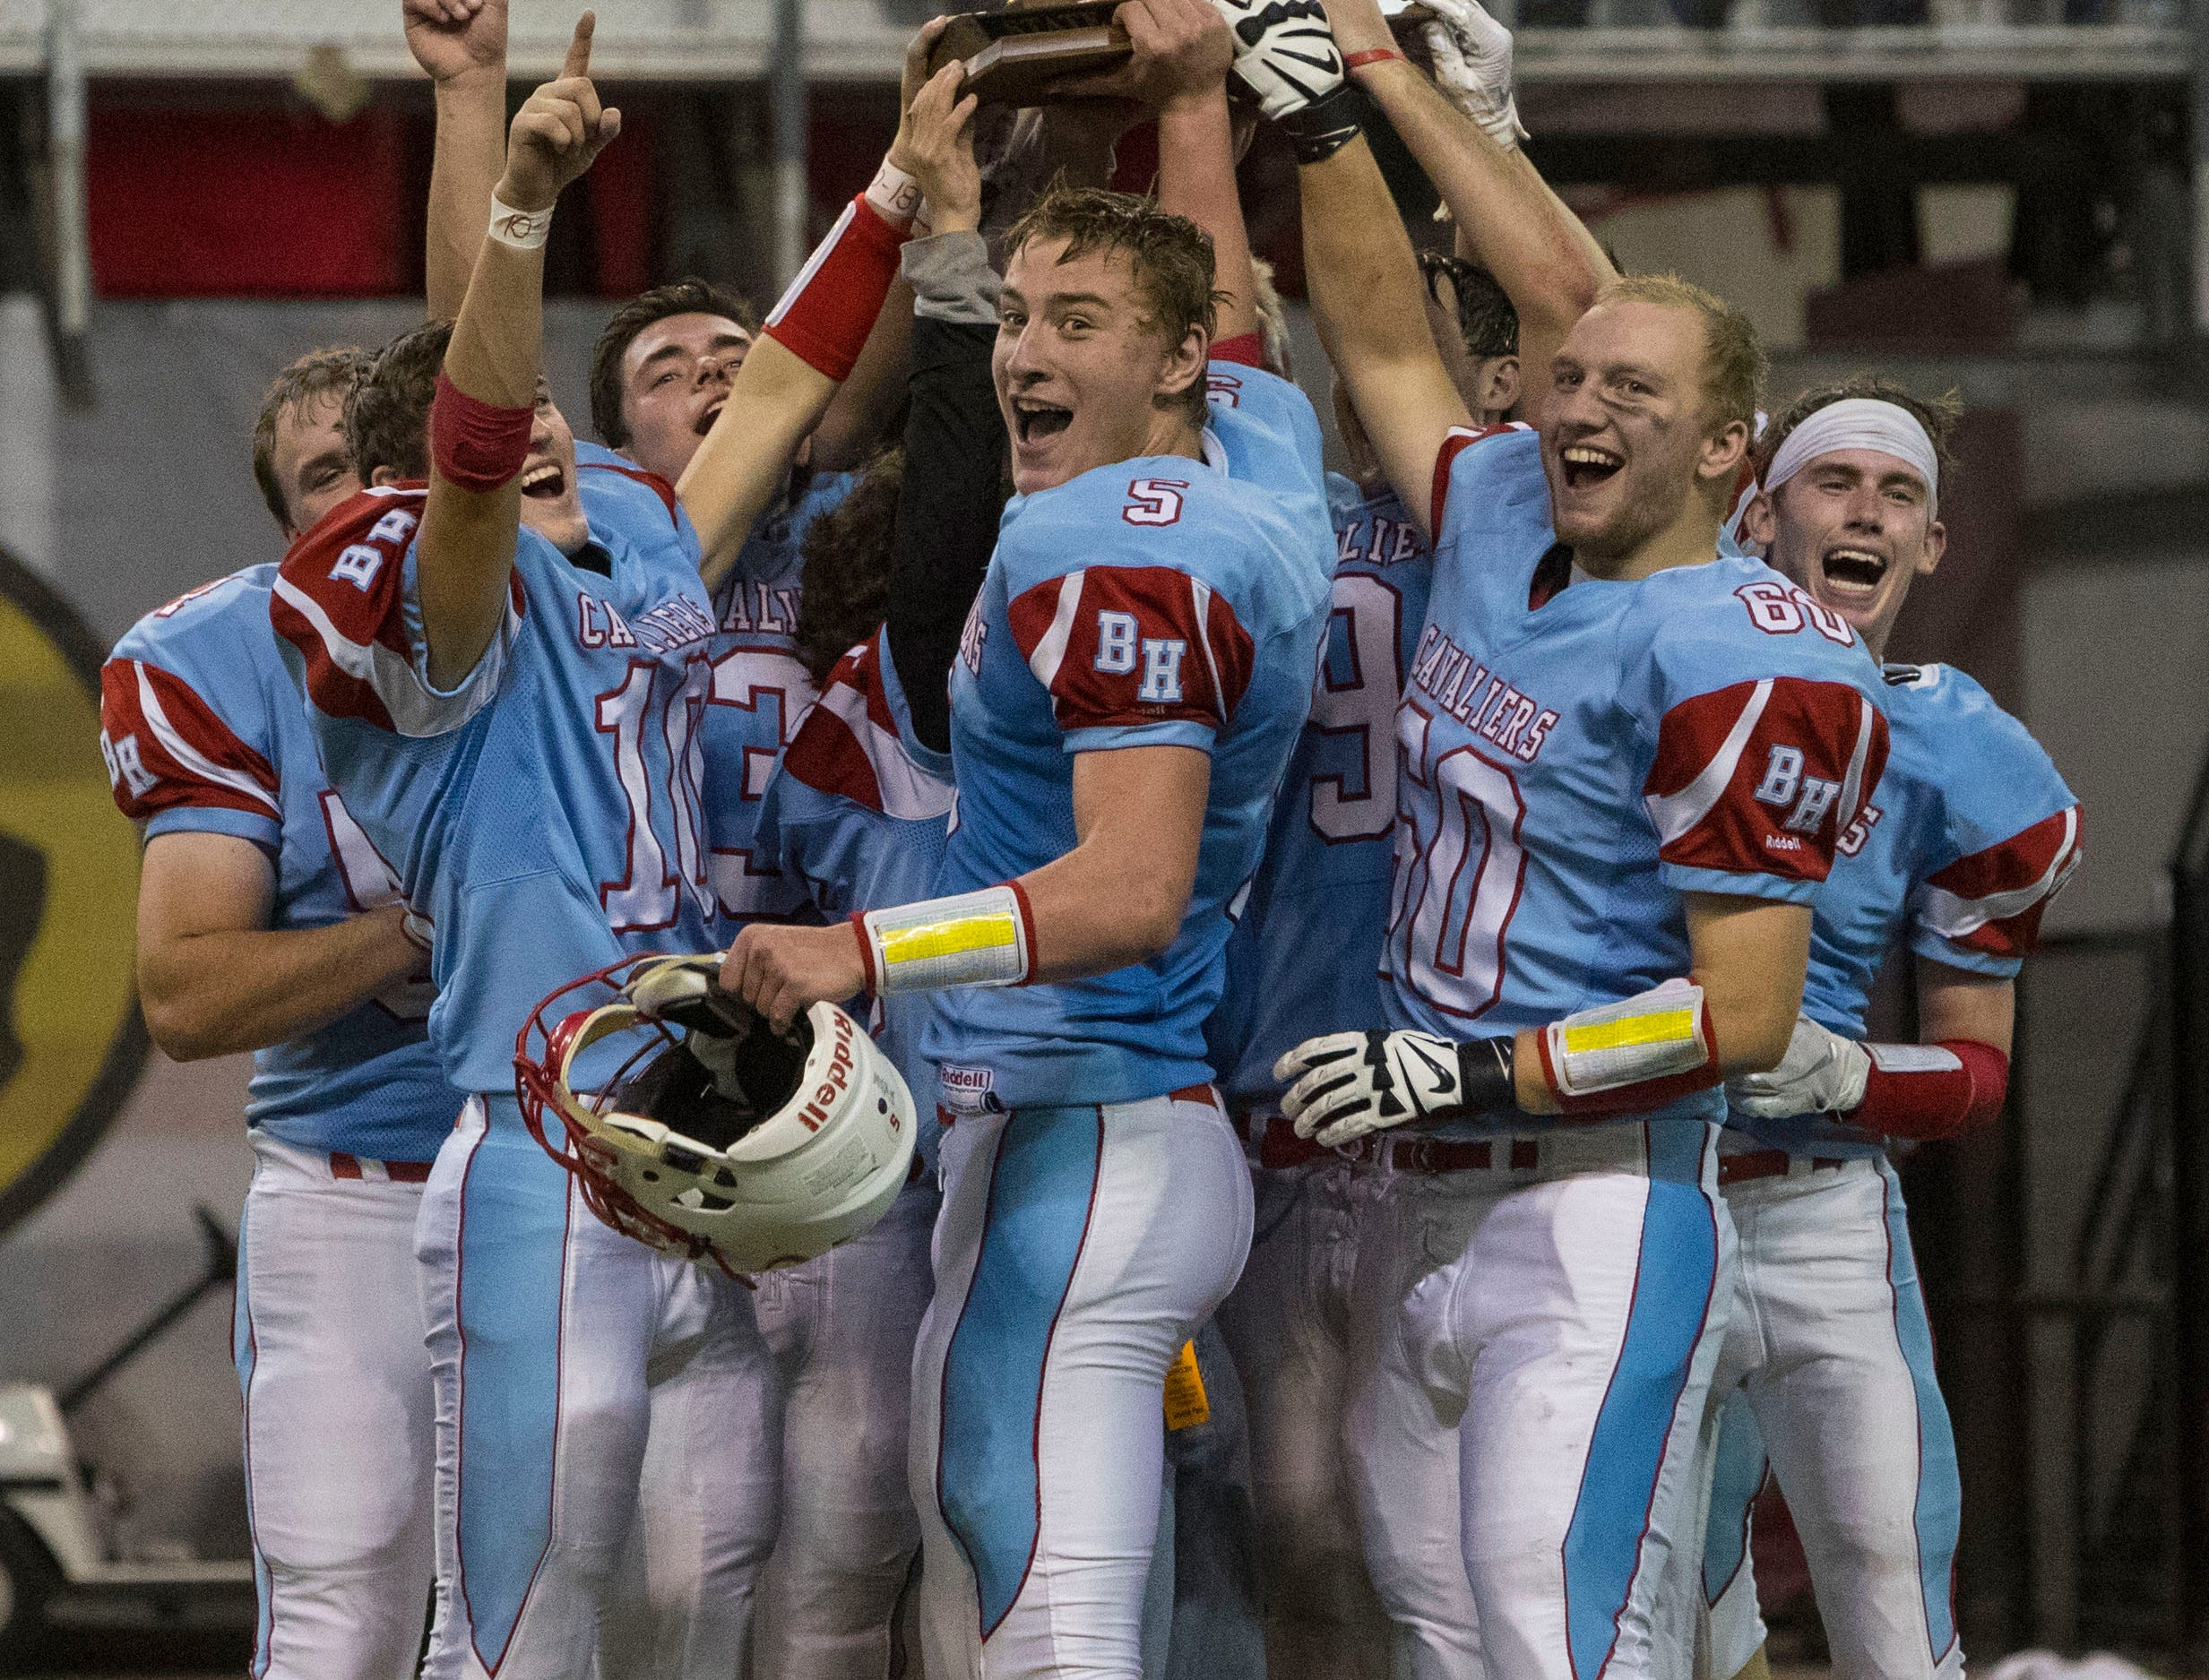 Bon Homme team celebrates after winning the class 9AA high school football championship, Thursday, Nov. 8, 2018 at the DakotaDome in Vermillion, S.D.